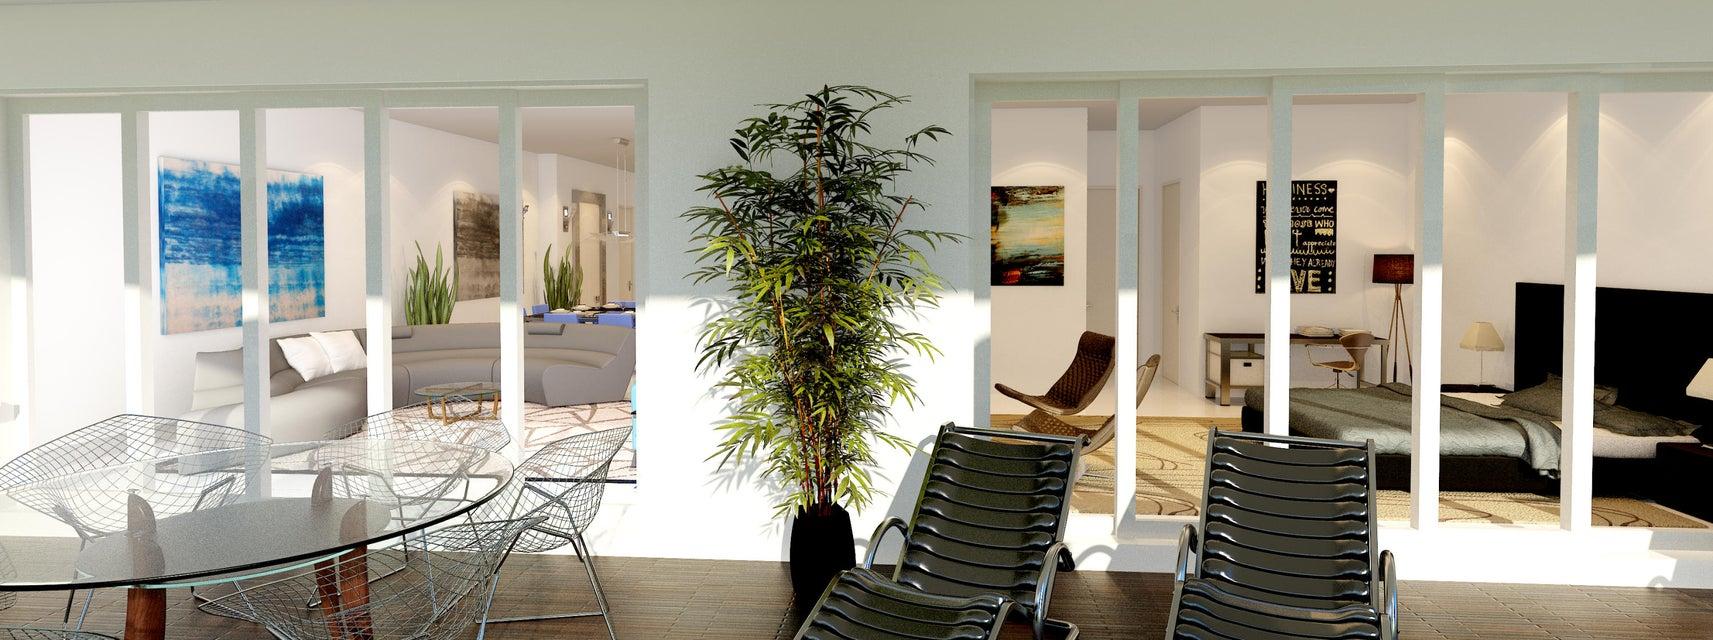 Additional photo for property listing at 327 E Royal Palm Road 327 E Royal Palm Road 博卡拉顿, 佛罗里达州 33432 美国